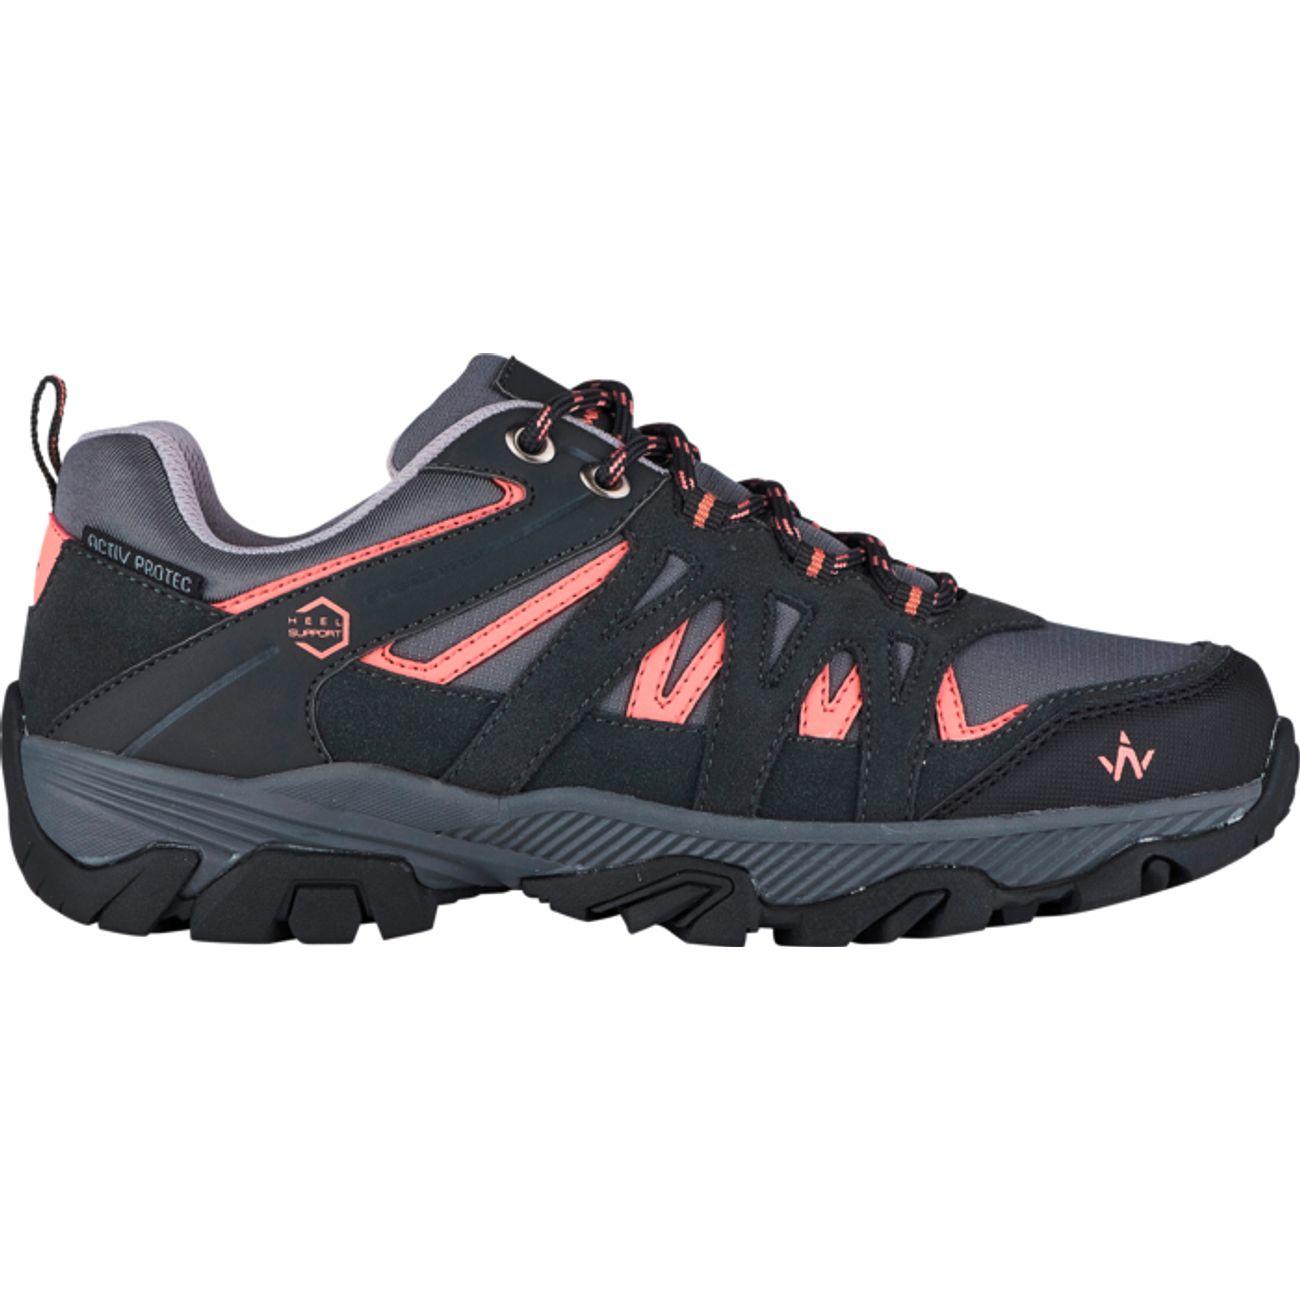 Randonnée Wp W 300 Wanabee Hike Chaussures Basses Low Femme thsQrCd